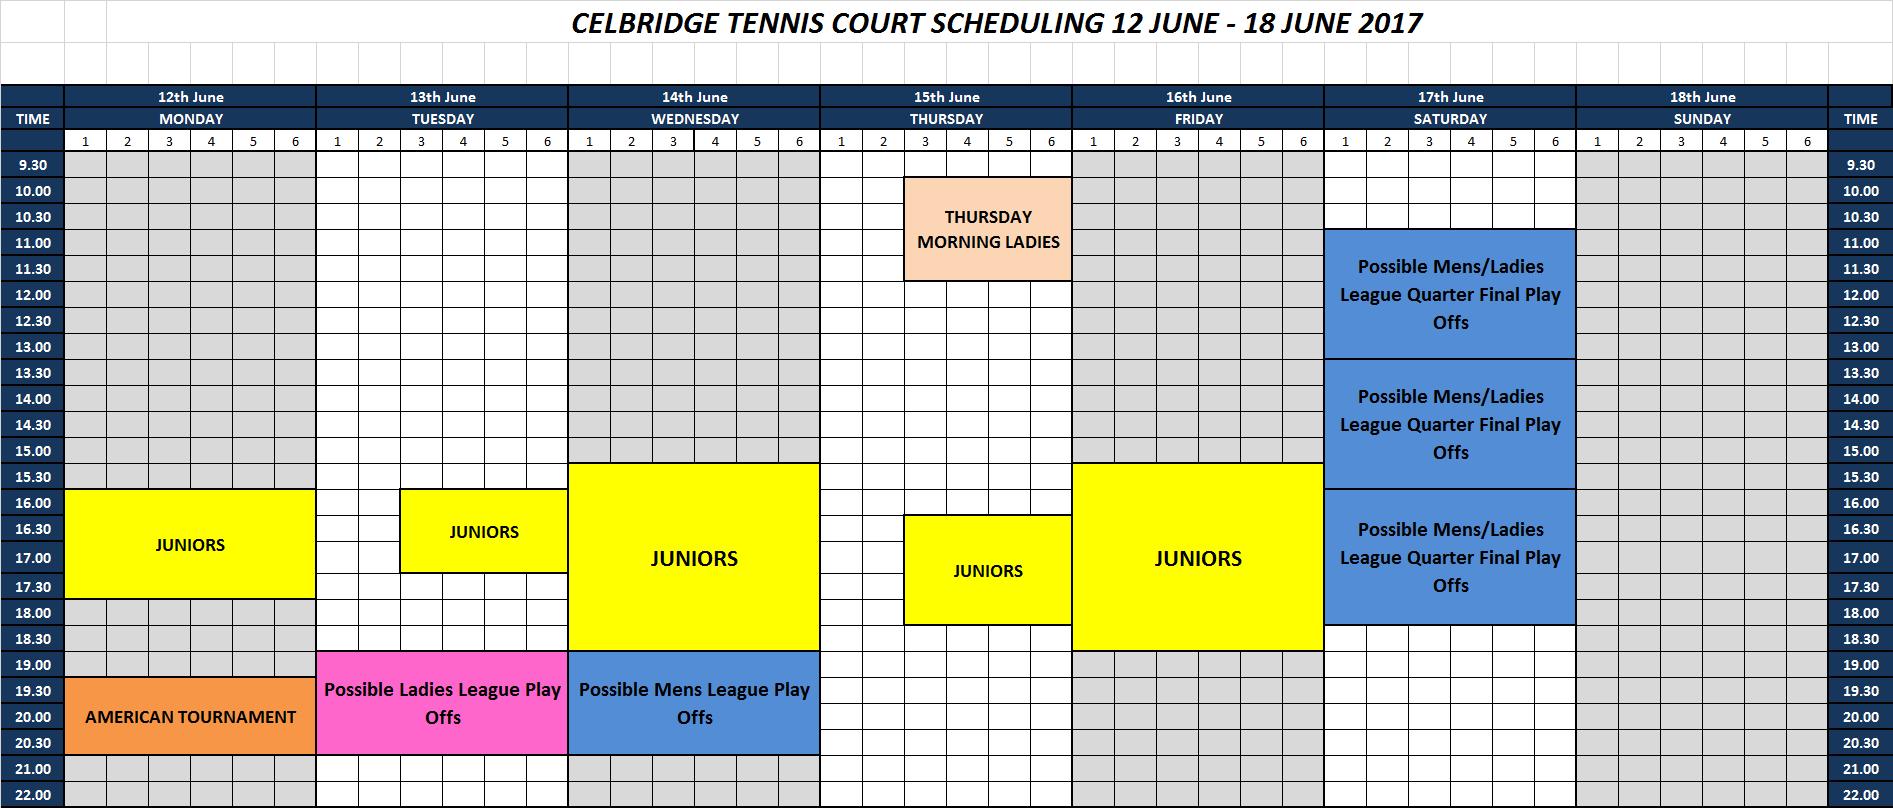 12-18 June